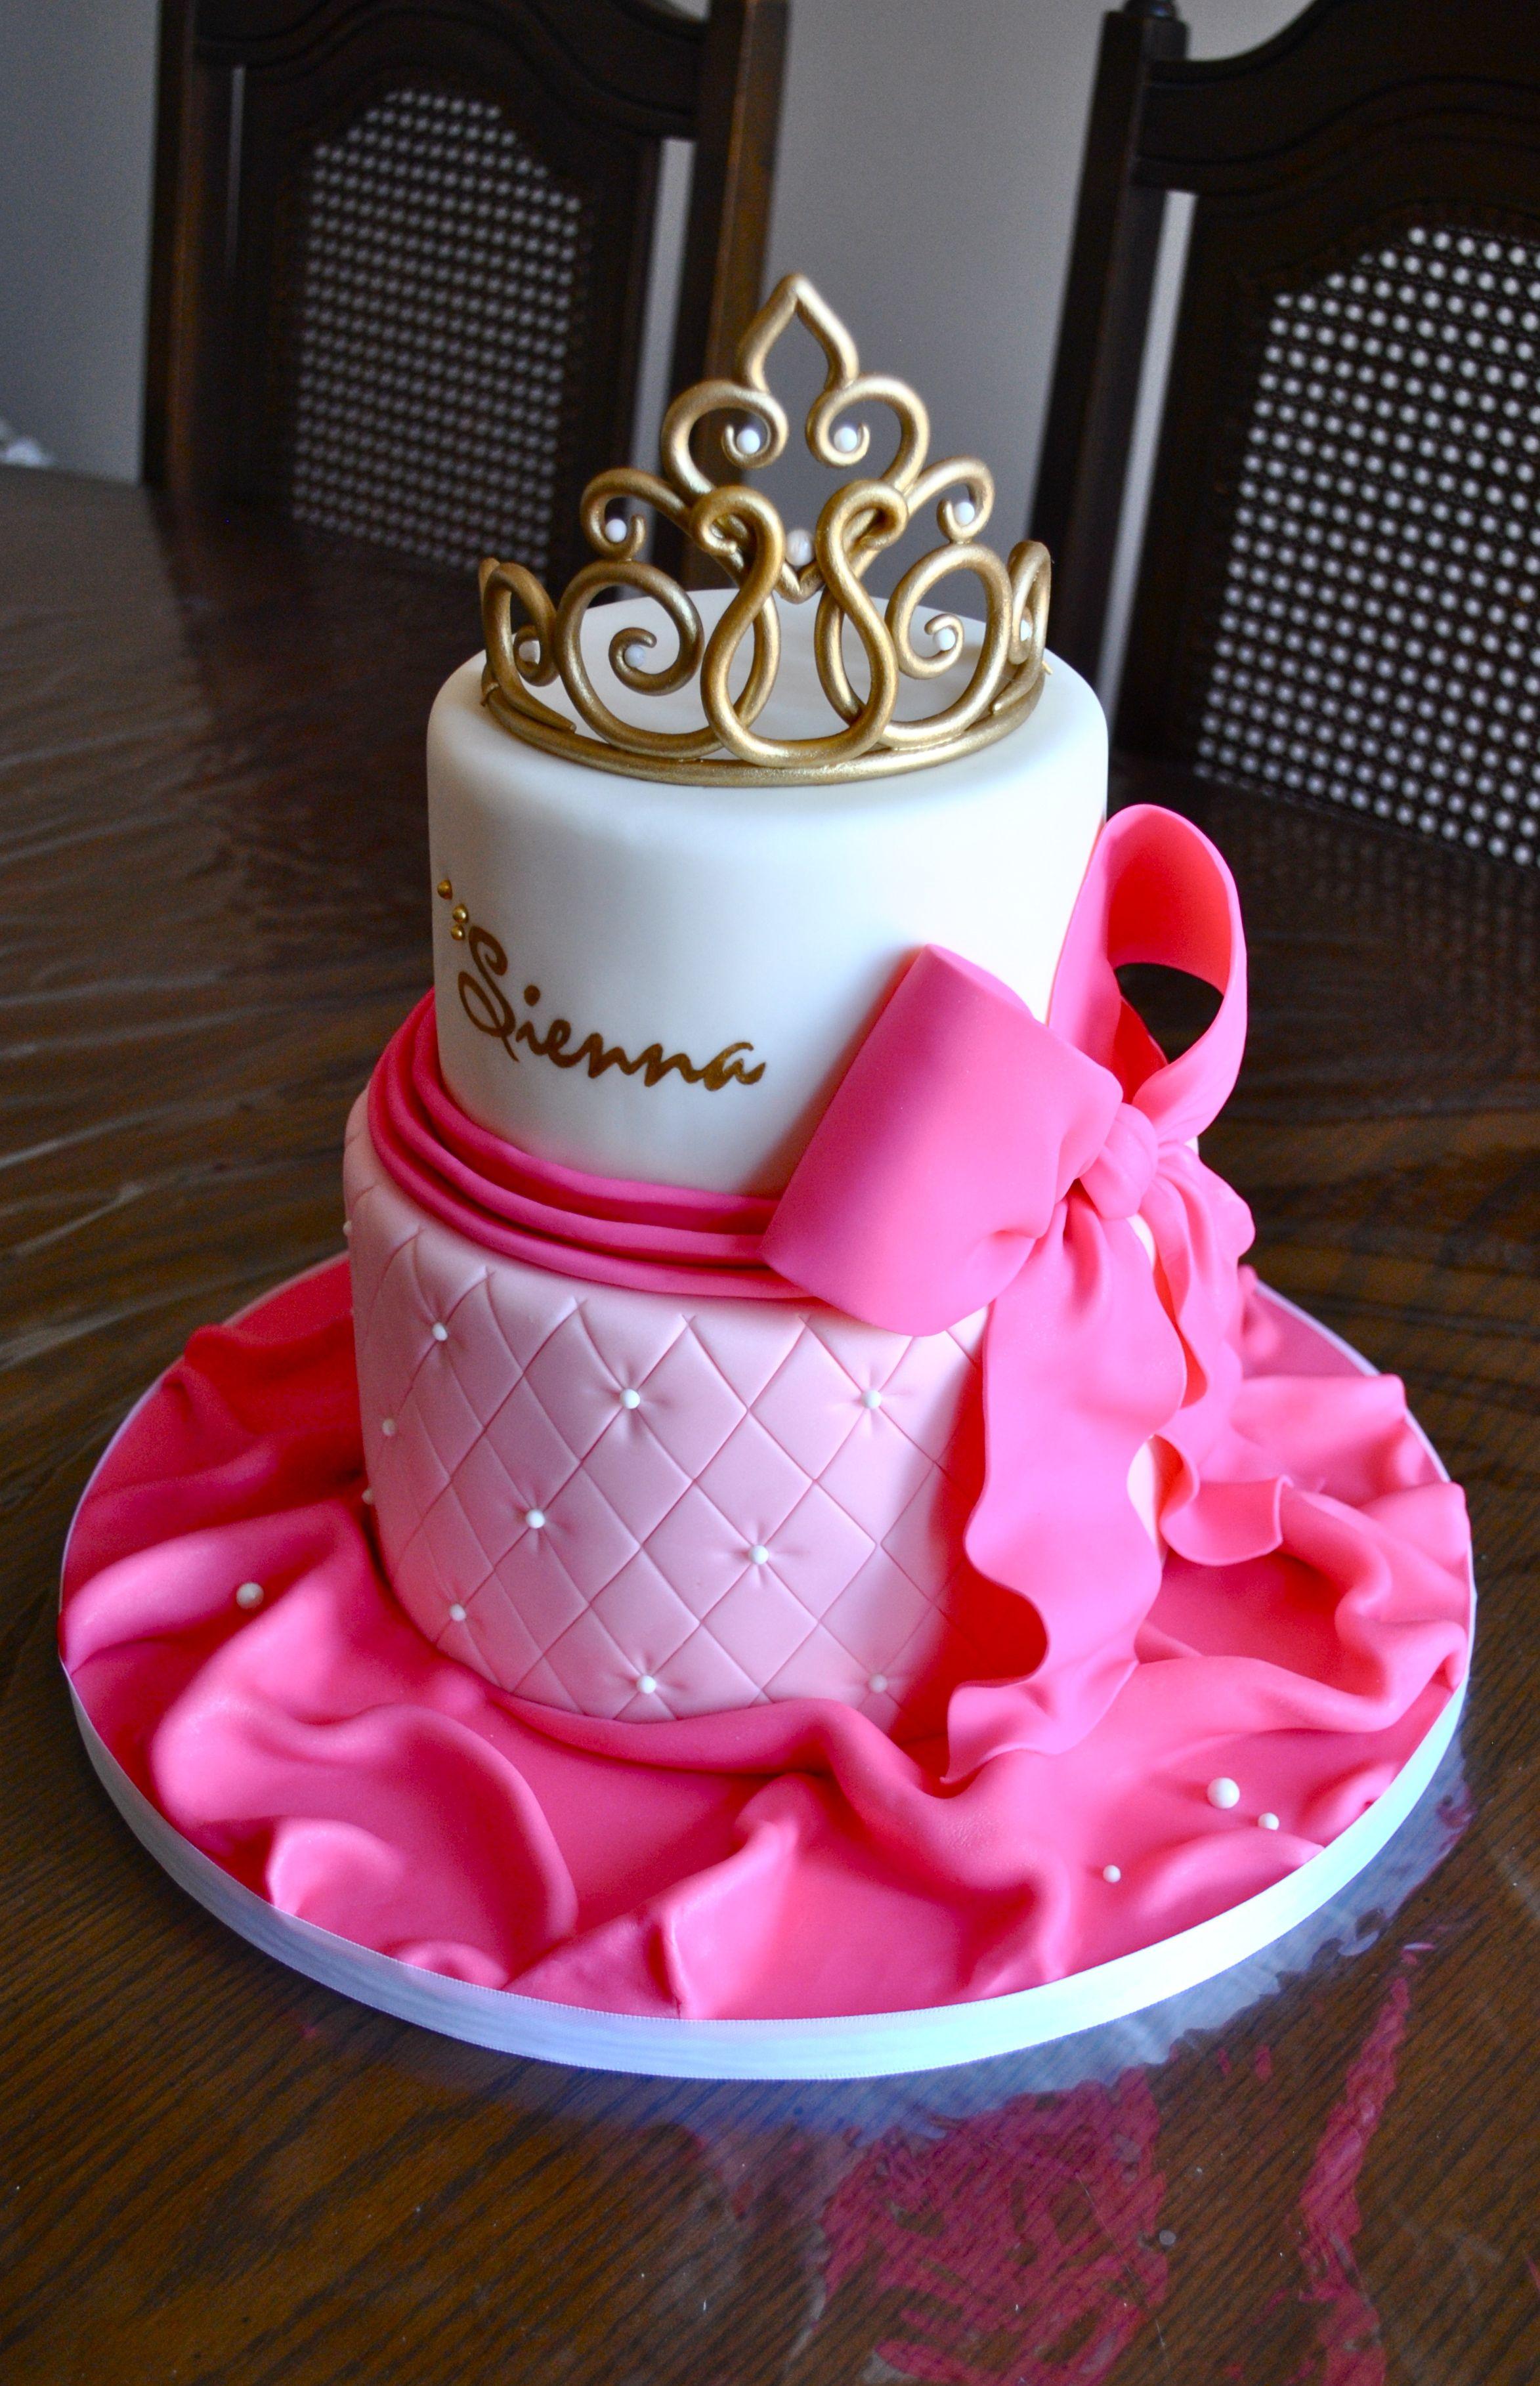 Baby Shower Cake For A Princess #Cake #Pinkandwhite #Quilted #Sweetlittlegirl